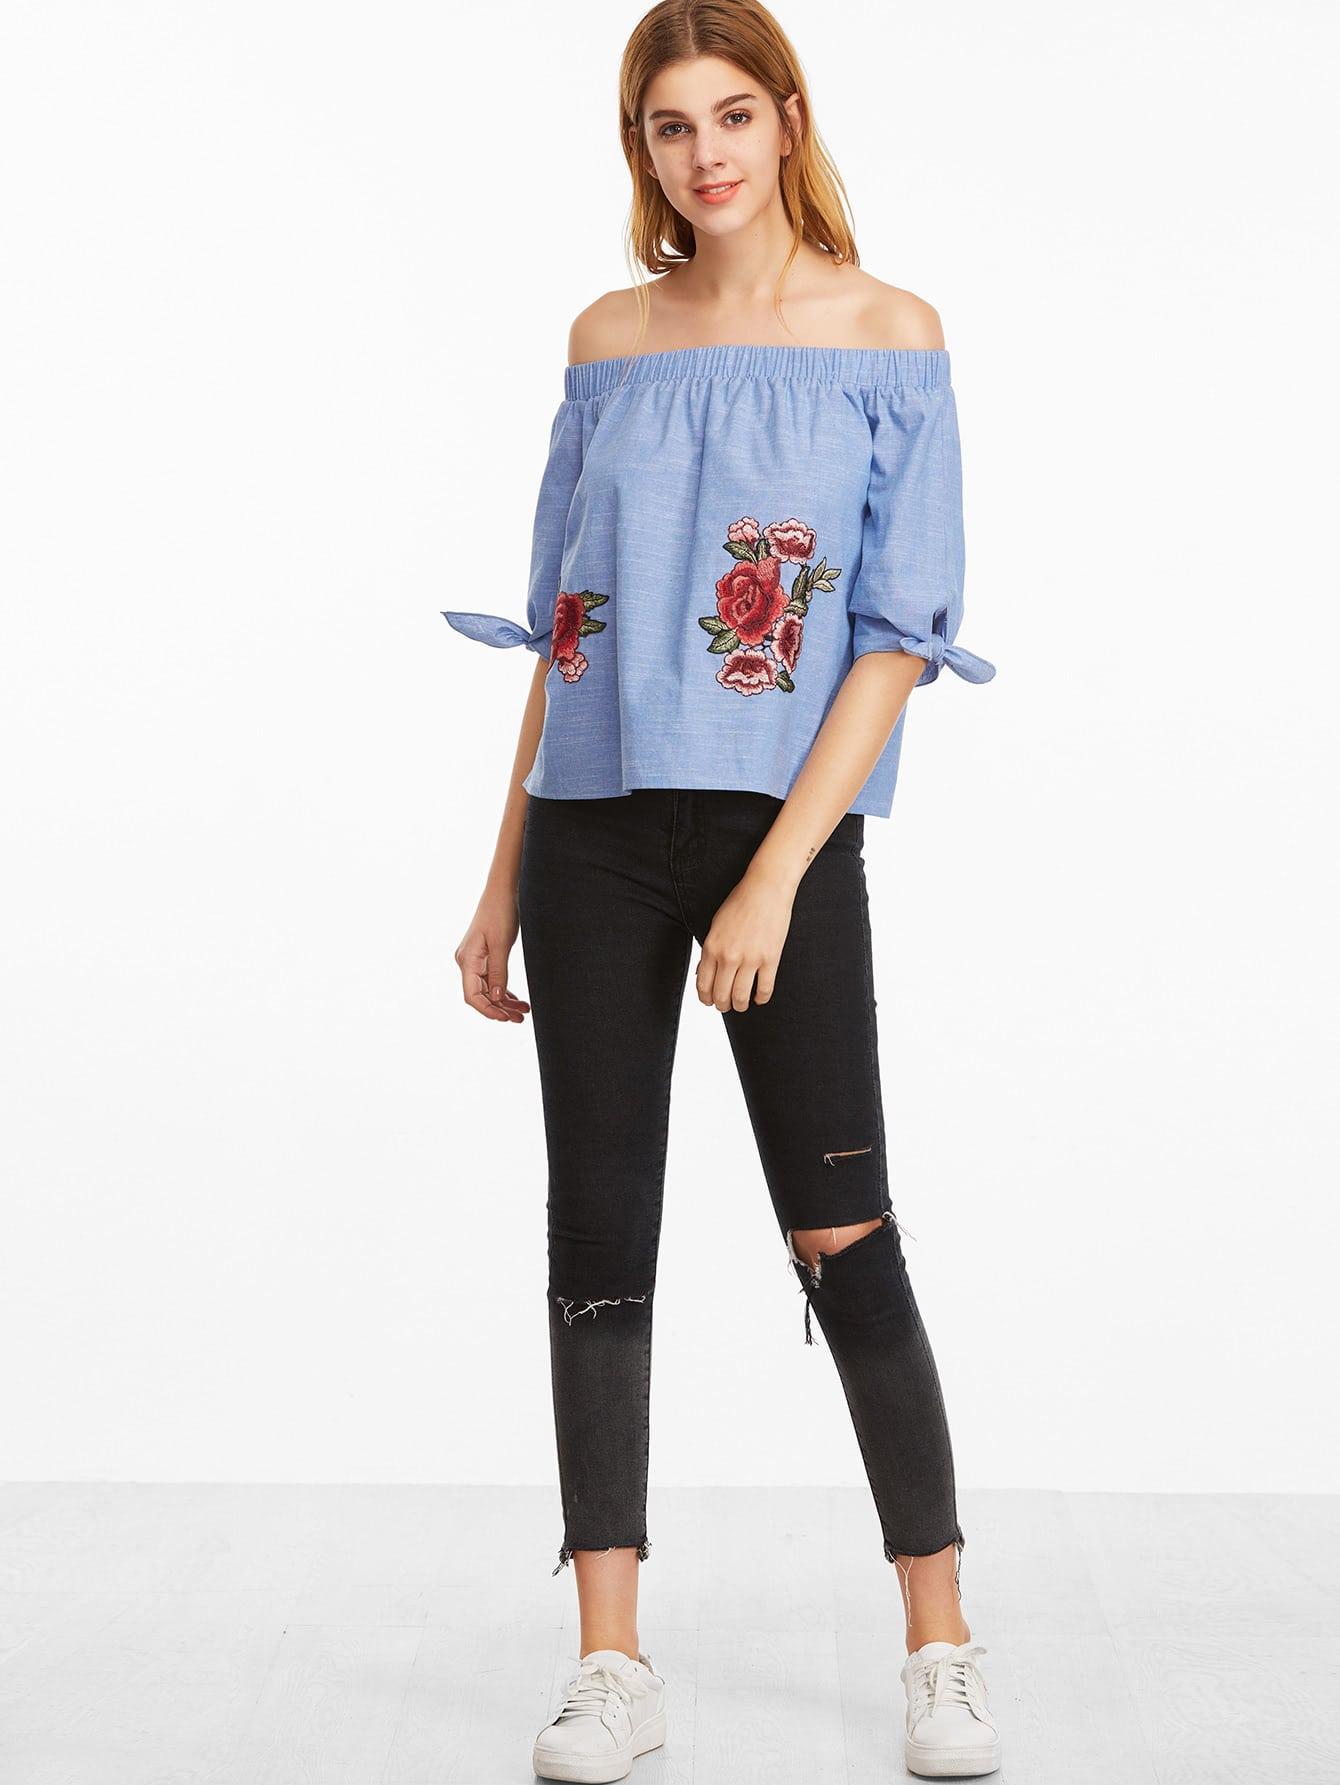 blouse161207704_2